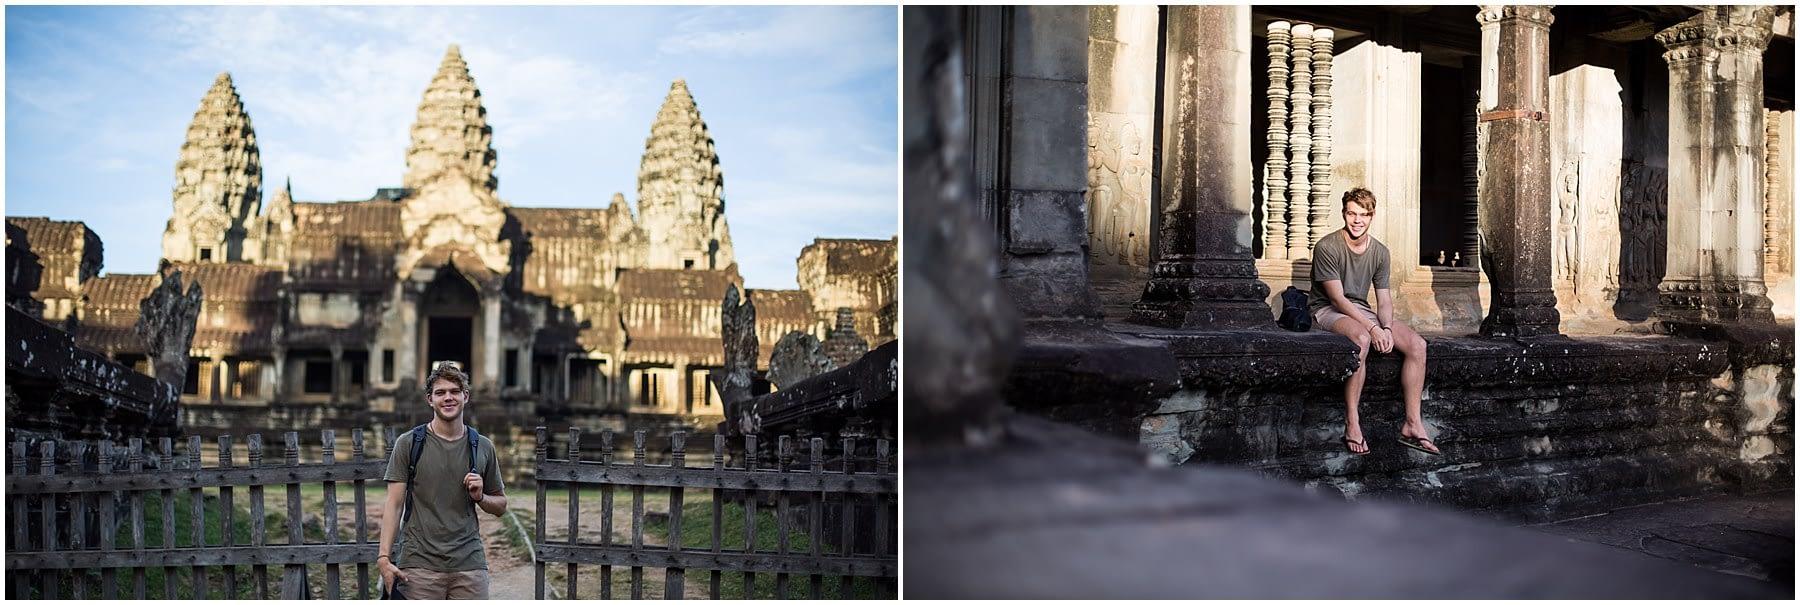 Cambodia_0030.jpg